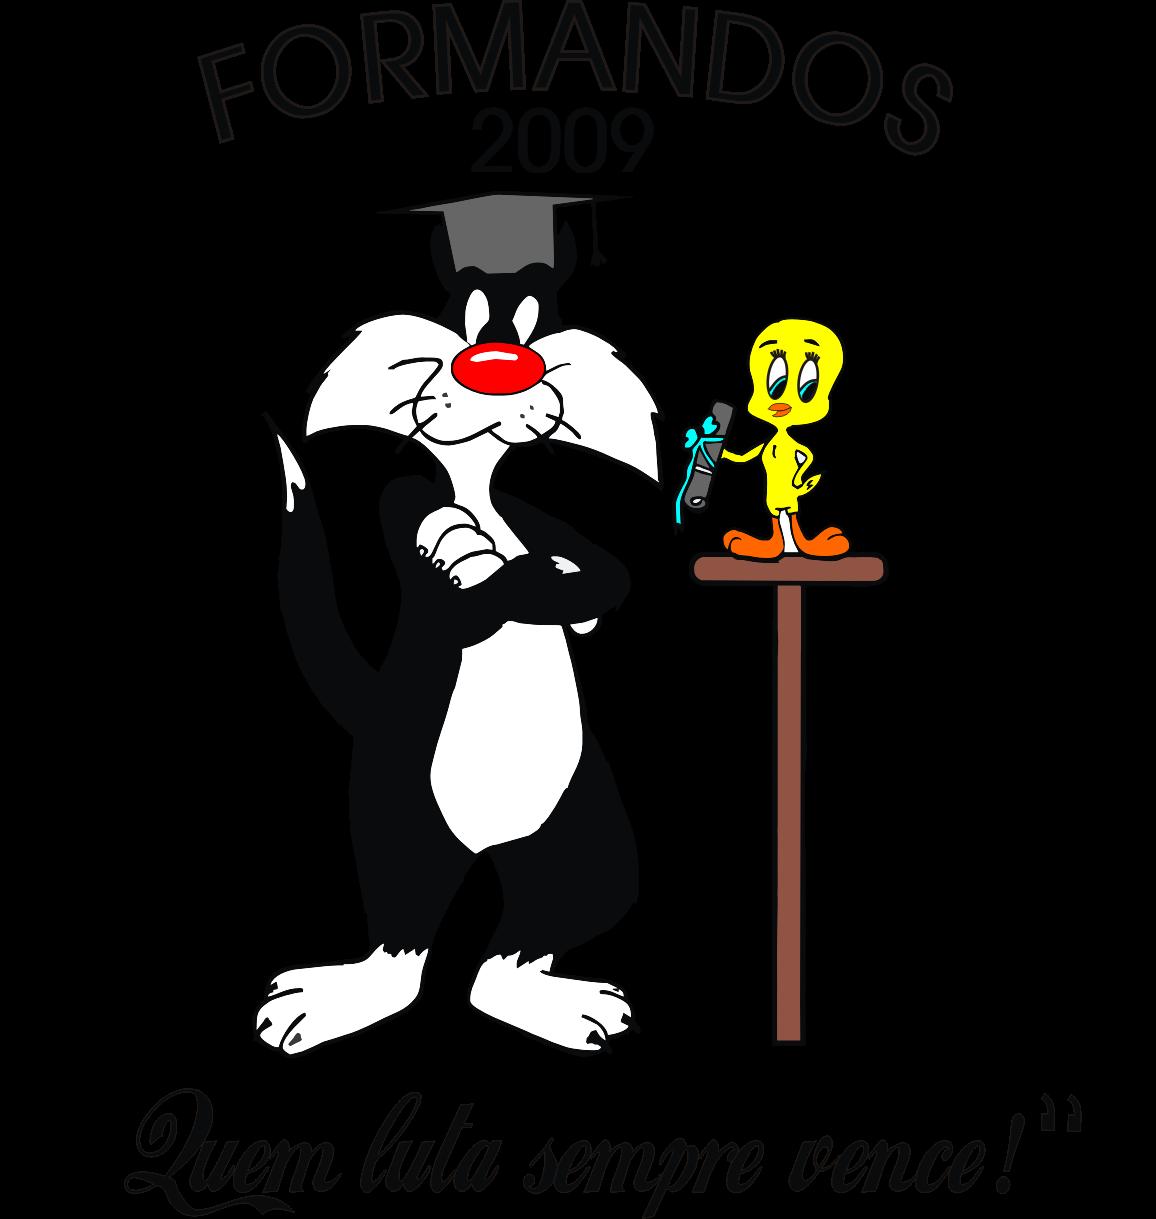 Camisetas Formandos 2014 - iOnline Brasil